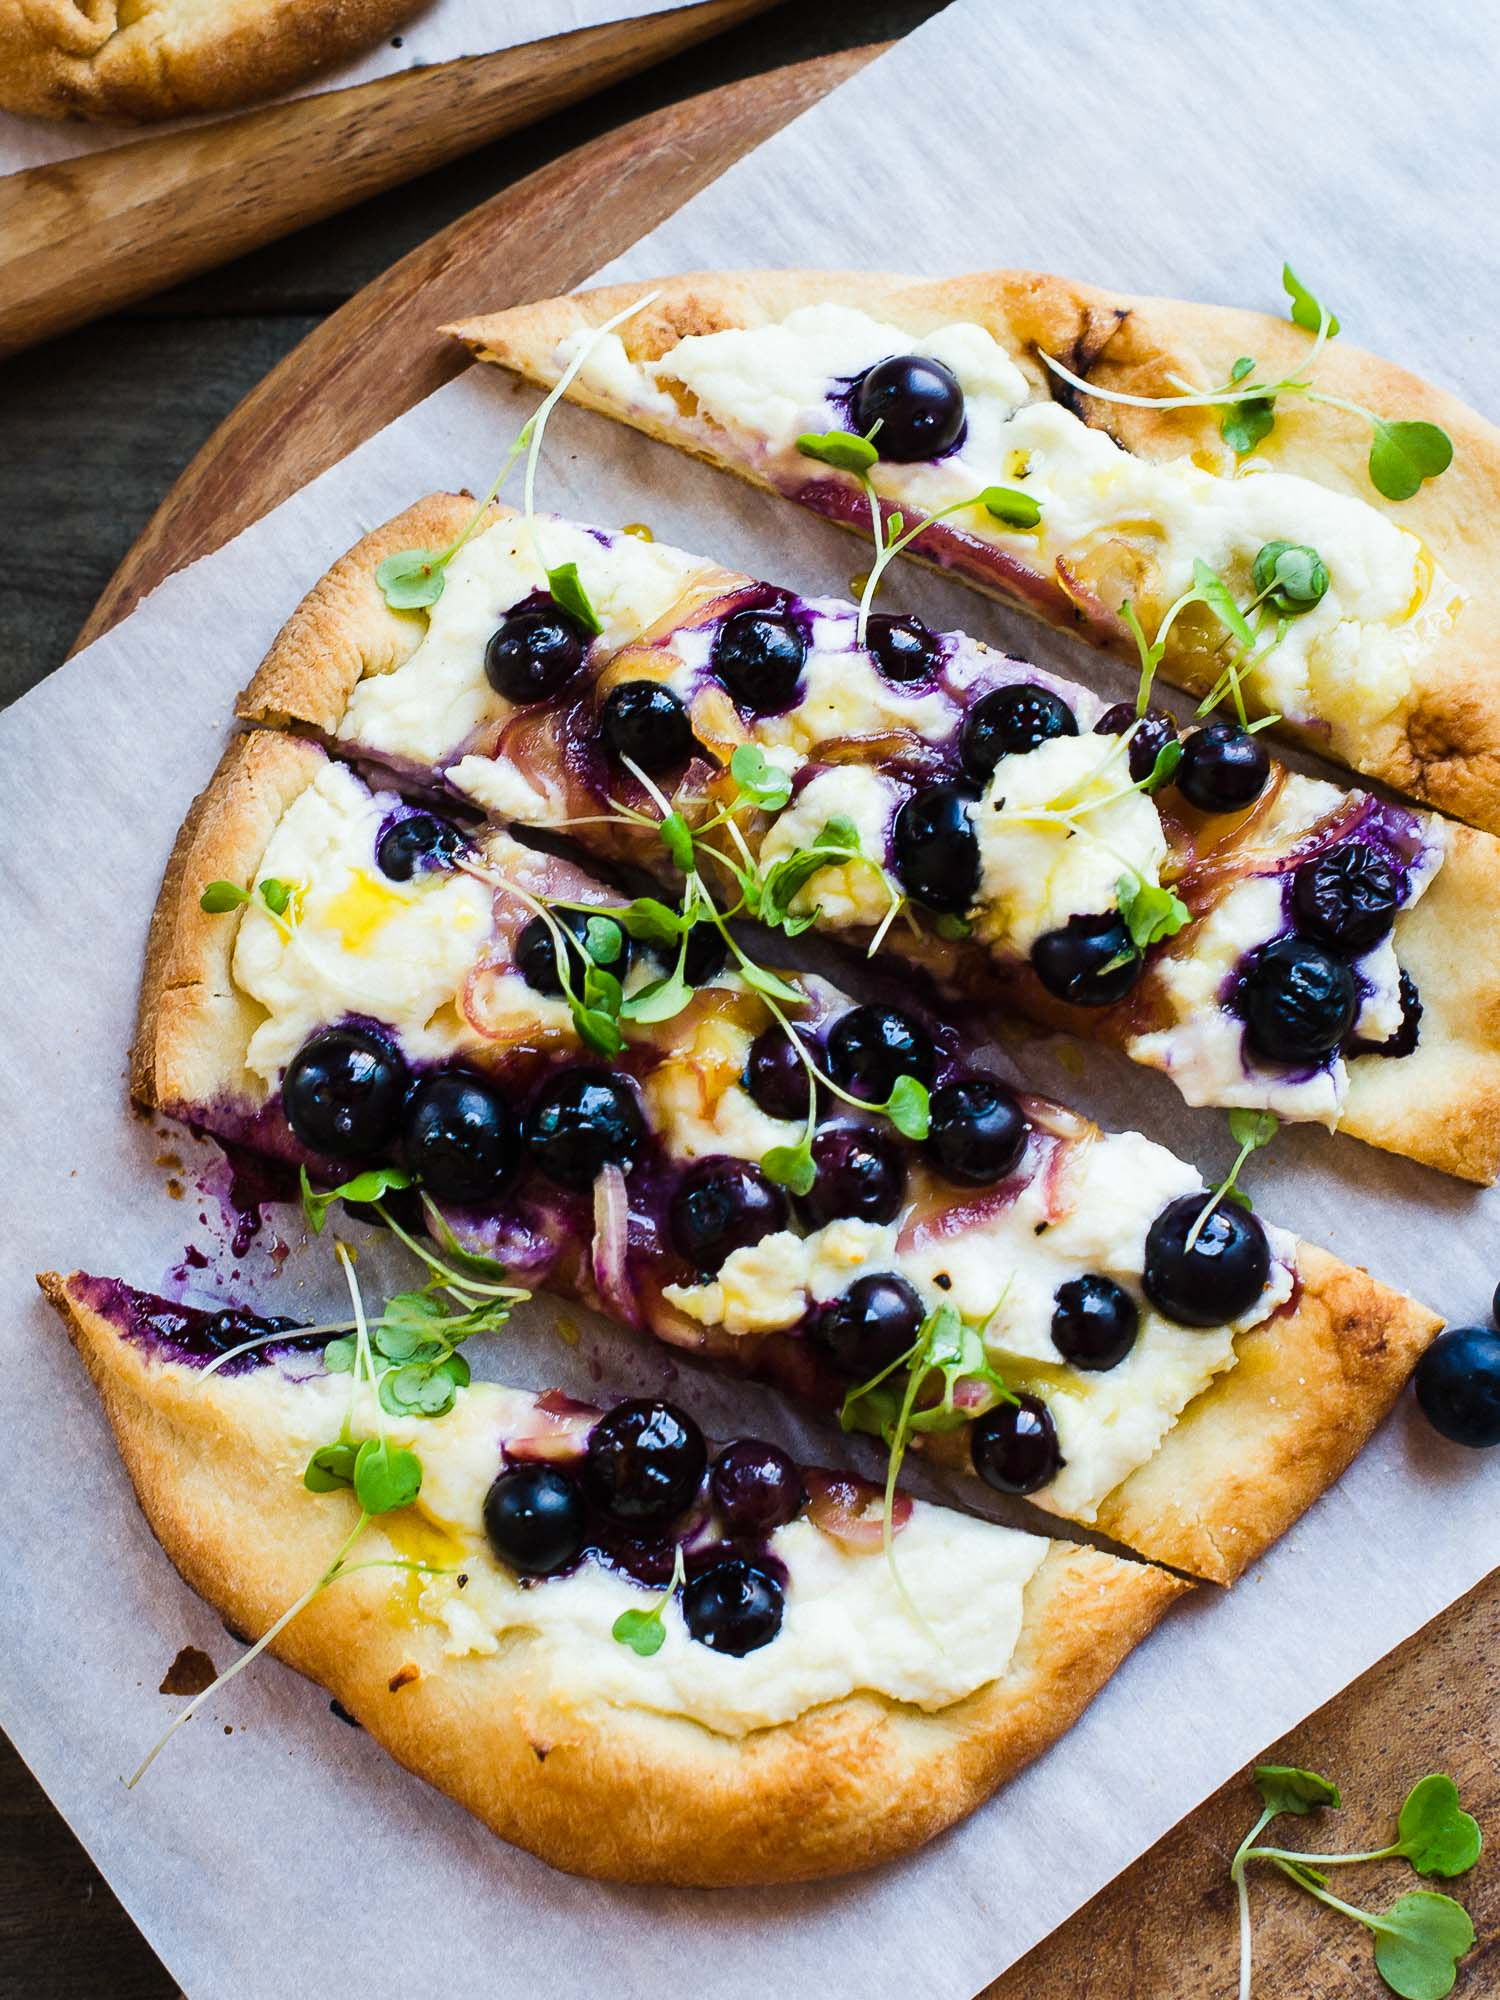 Blueberry-Feta-and-Honey-Caramelized-Onion-Naan-Pizza-www.kitchenconfidante.com-DSC_0065-1.jpg